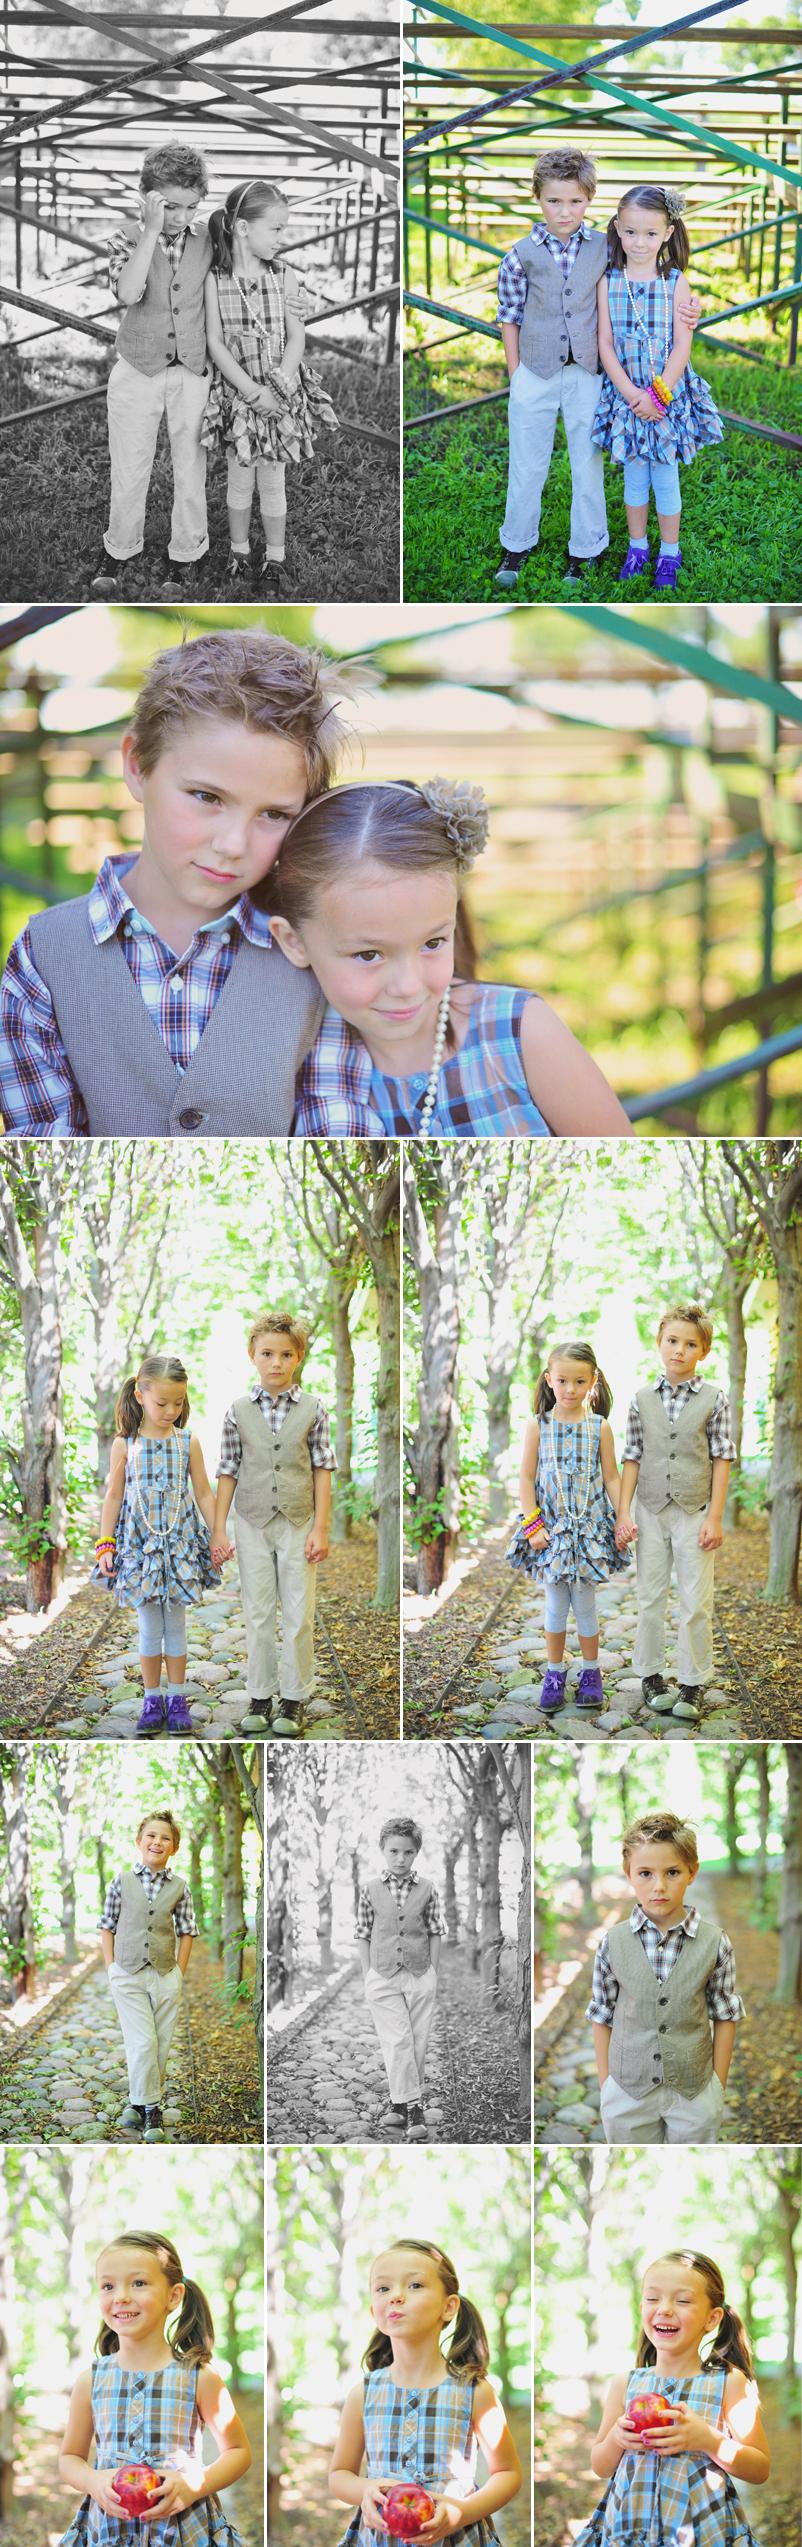 Chicagoland Family Photography, Aurora Illinois Family Photography, Geneva, Batavia Family Photography, Chicagoland Family Photography, modern Kids Photography Chicago